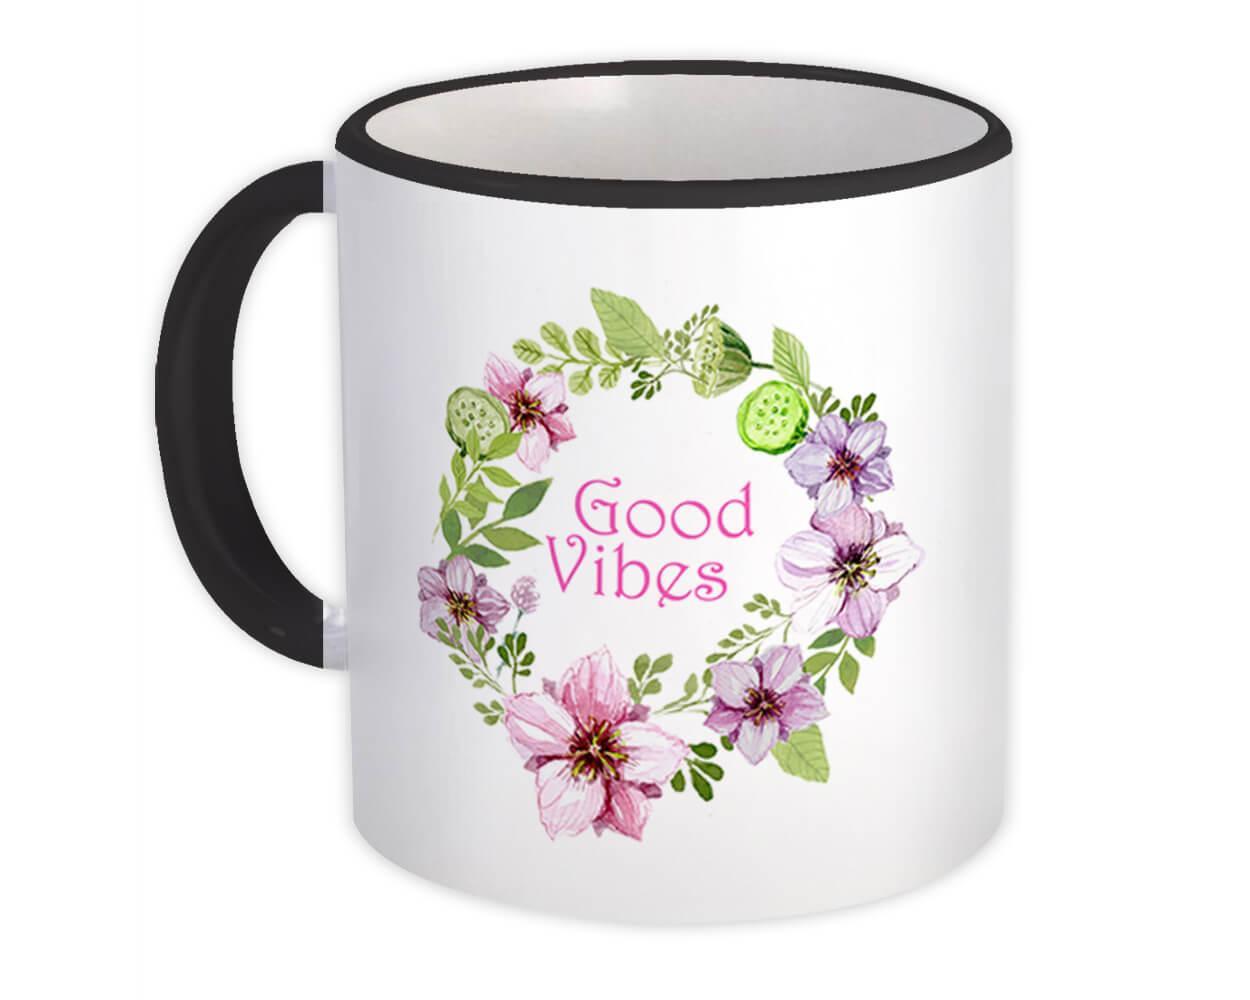 Good Vibes : Gift Mug Quote Inspirational Decor Floral